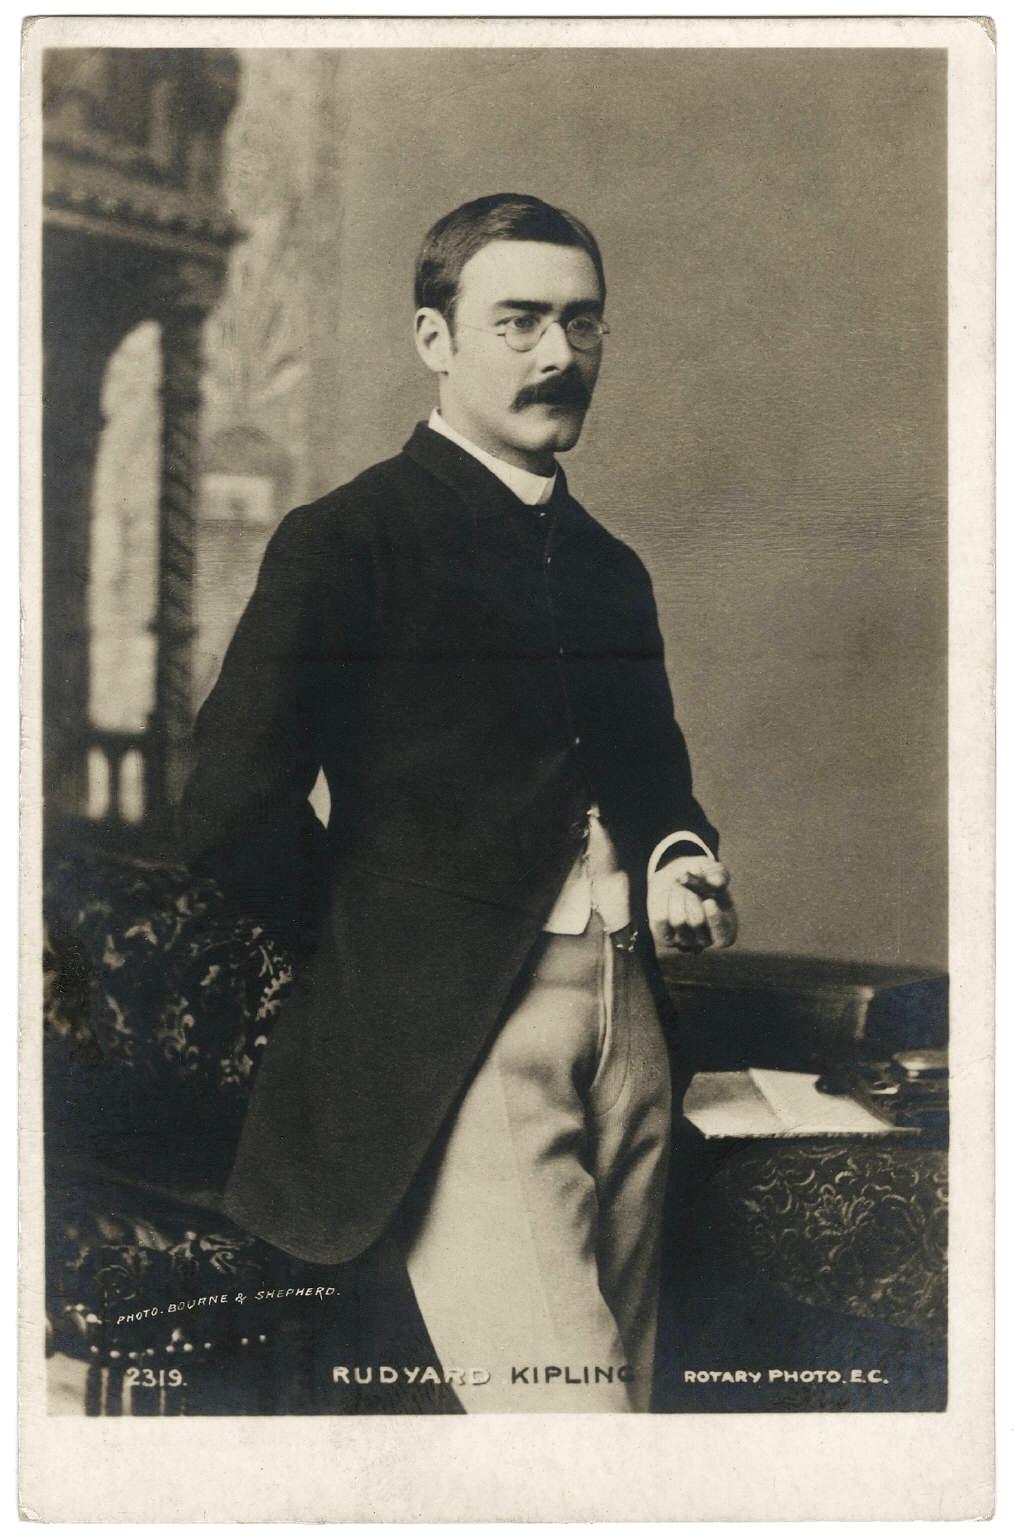 Rudyard_Kipling_three_quarter_length_portrait.jpg